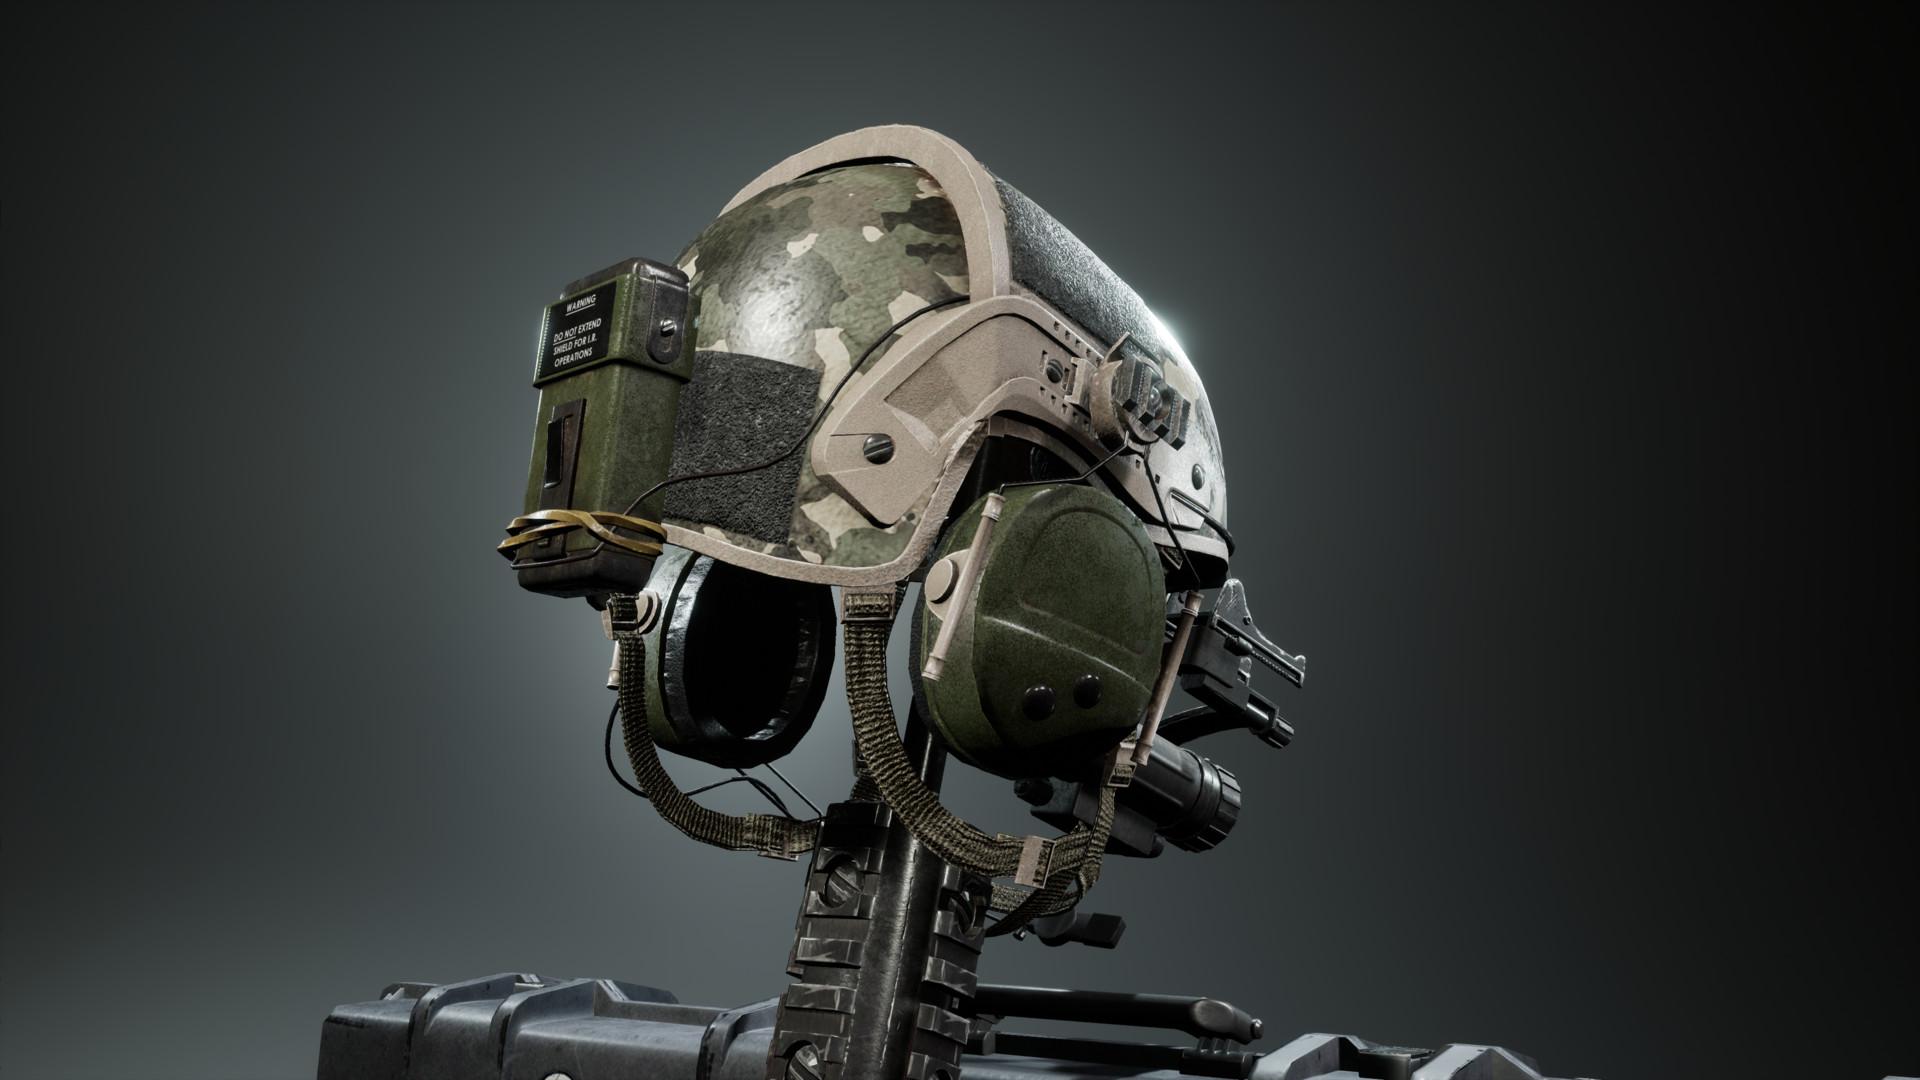 ArtStation - Army Helmet, Gaetan Thibaut